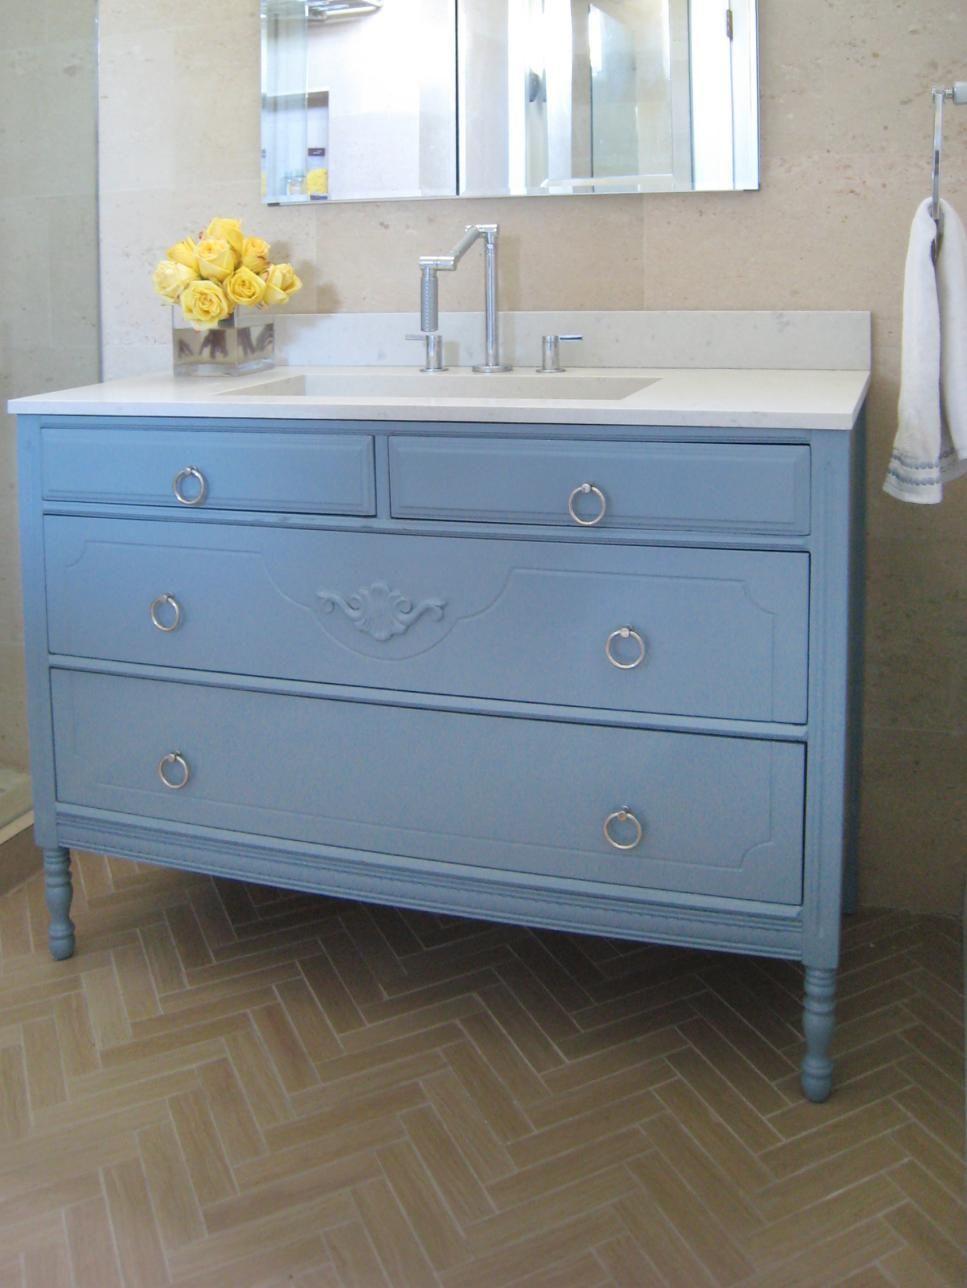 20 Upcycled And One Of A Kind Bathroom Vanities Diy Bathroom